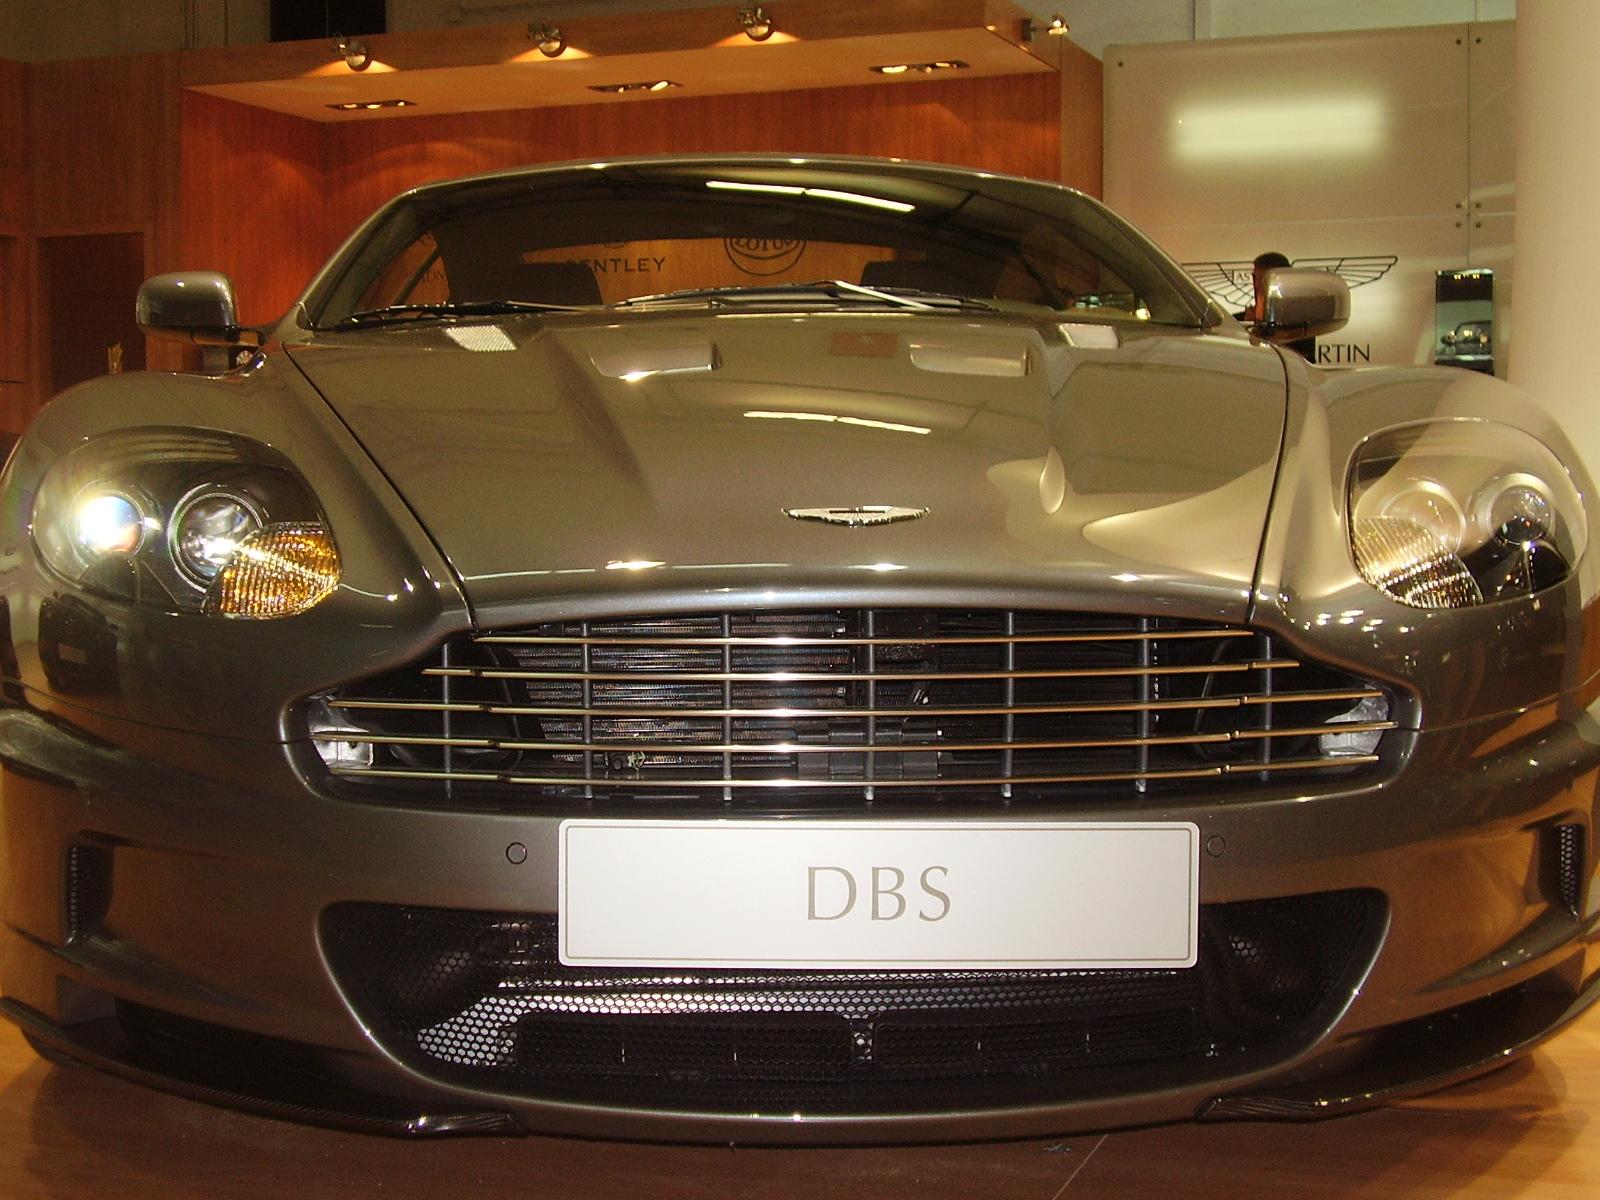 Visita Salon Automovil 09 BCN / Visit to Car Exhibition 09 Barcelona-P5140768.JPG